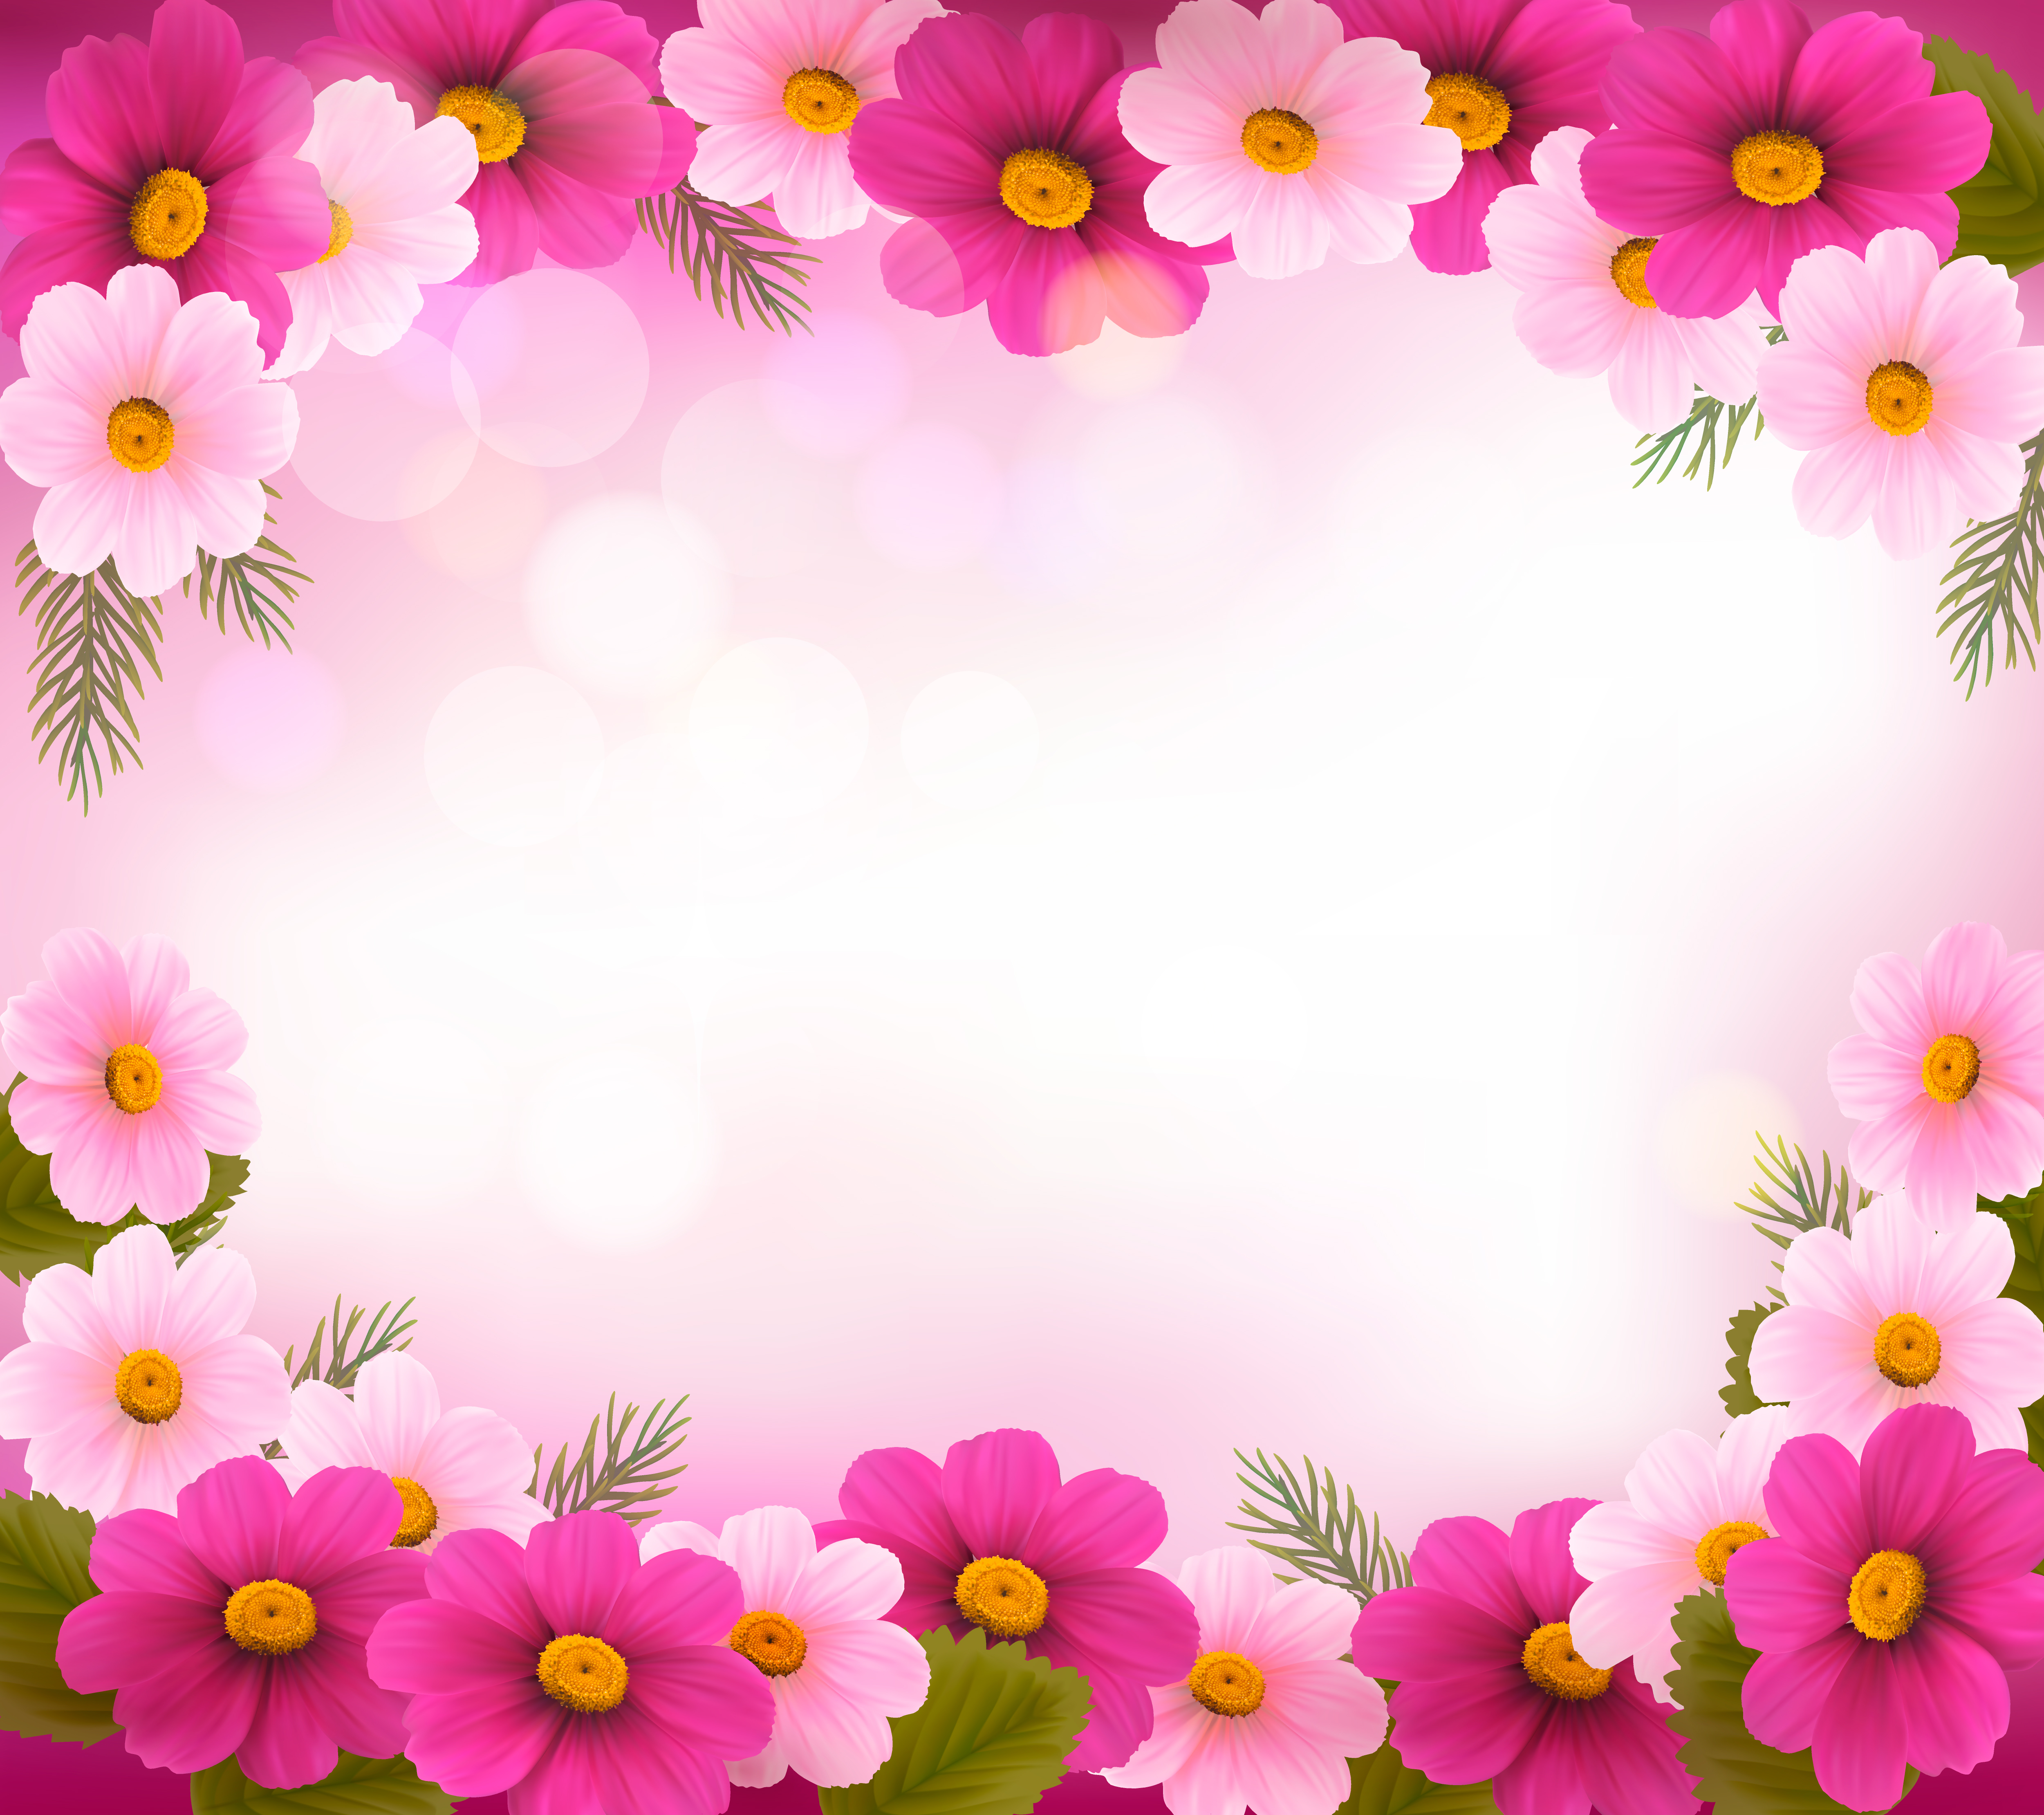 Рамка для розовые цветы